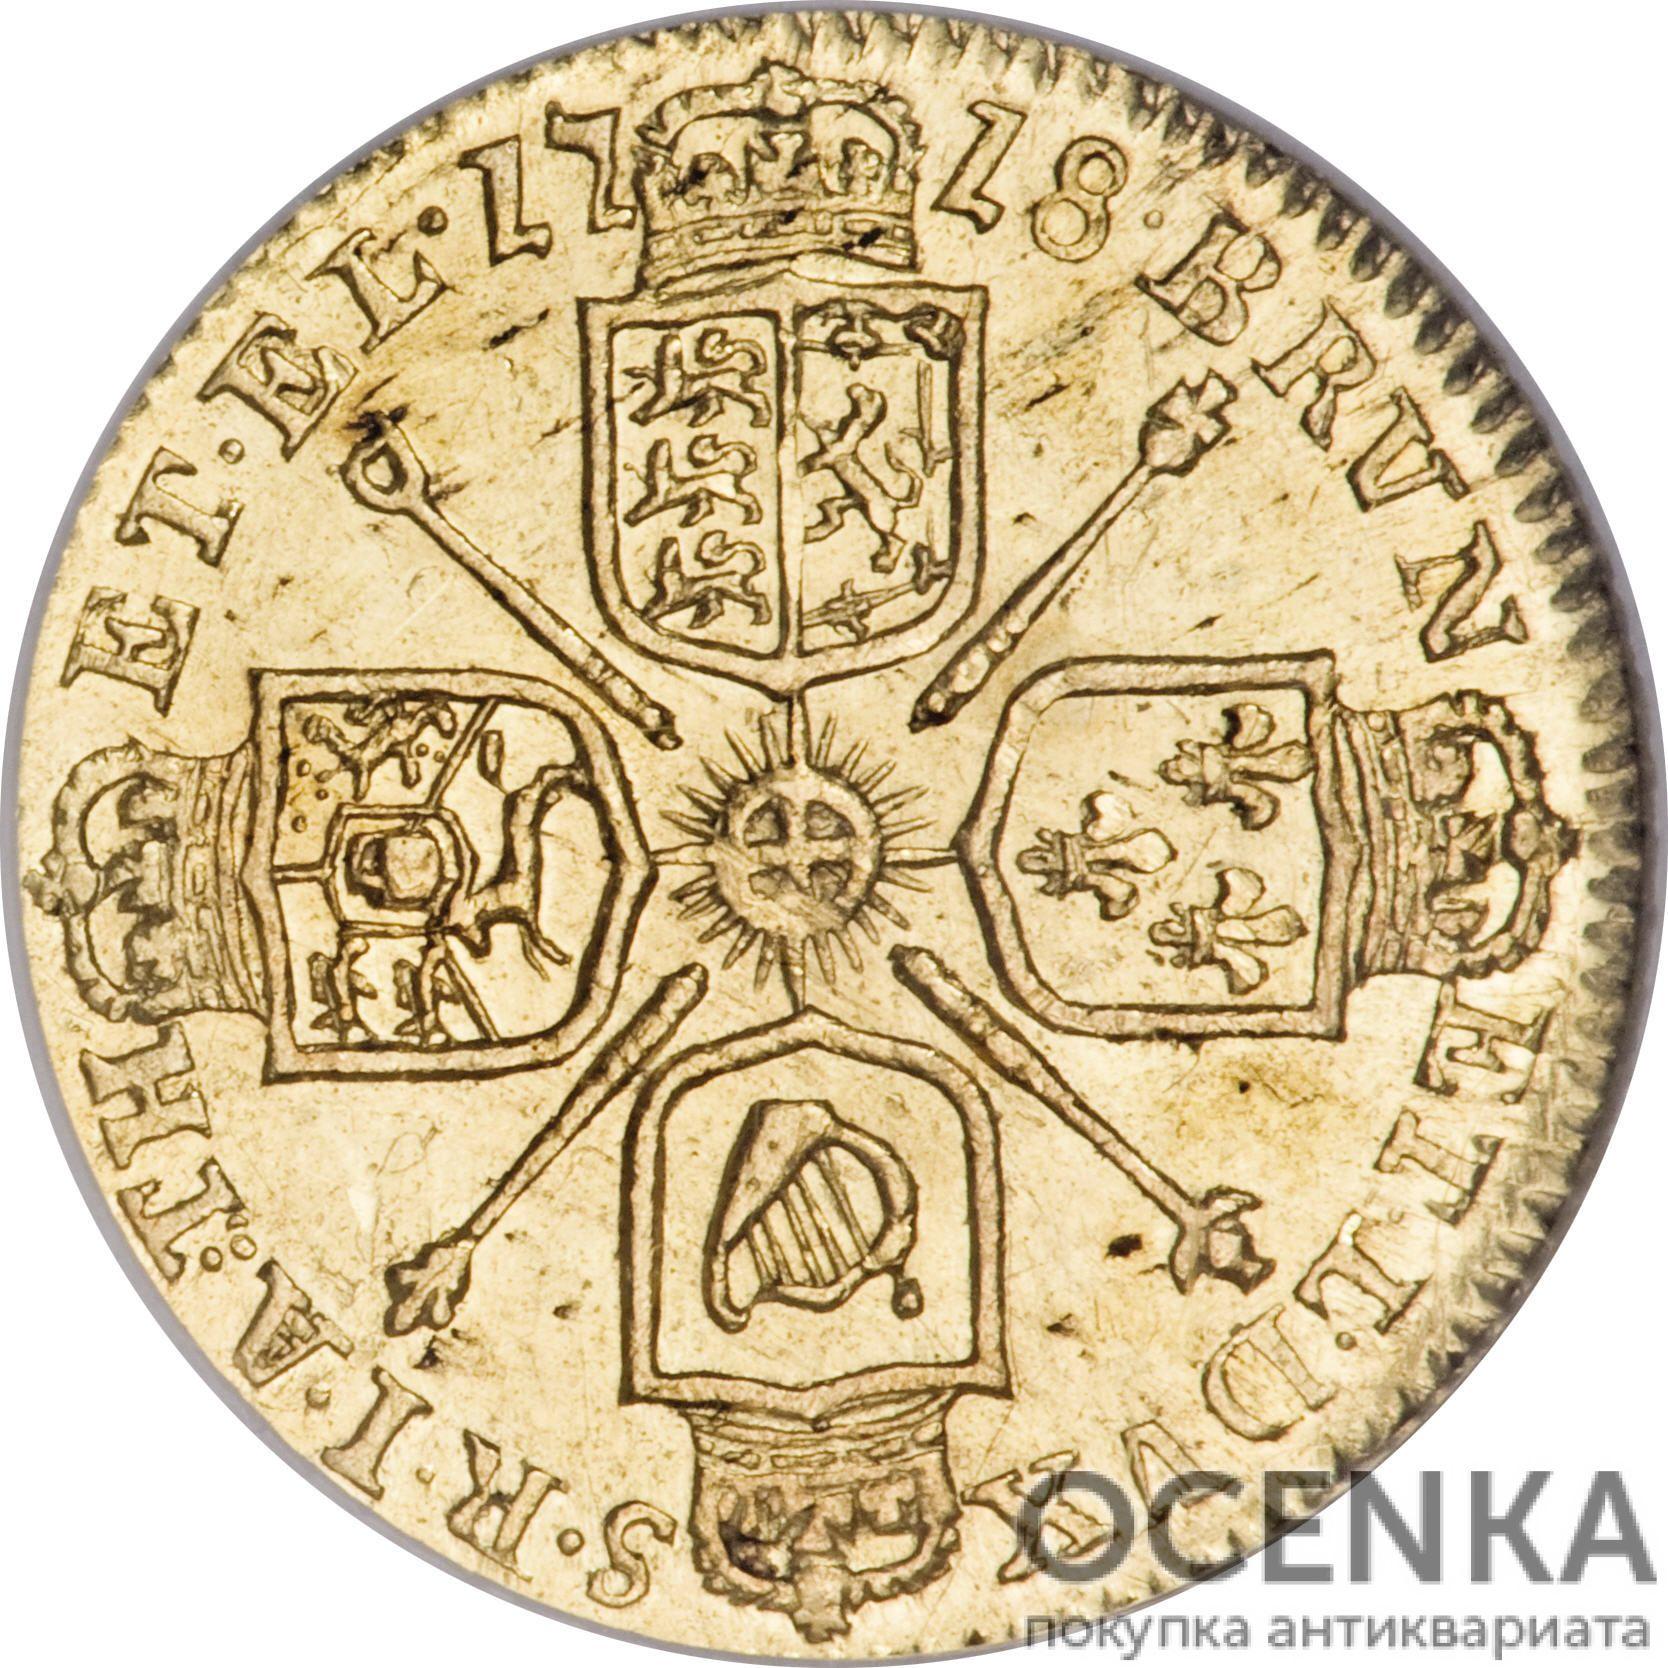 Золотая монета ¼ Guinea (1/4 гинеи) Великобритания